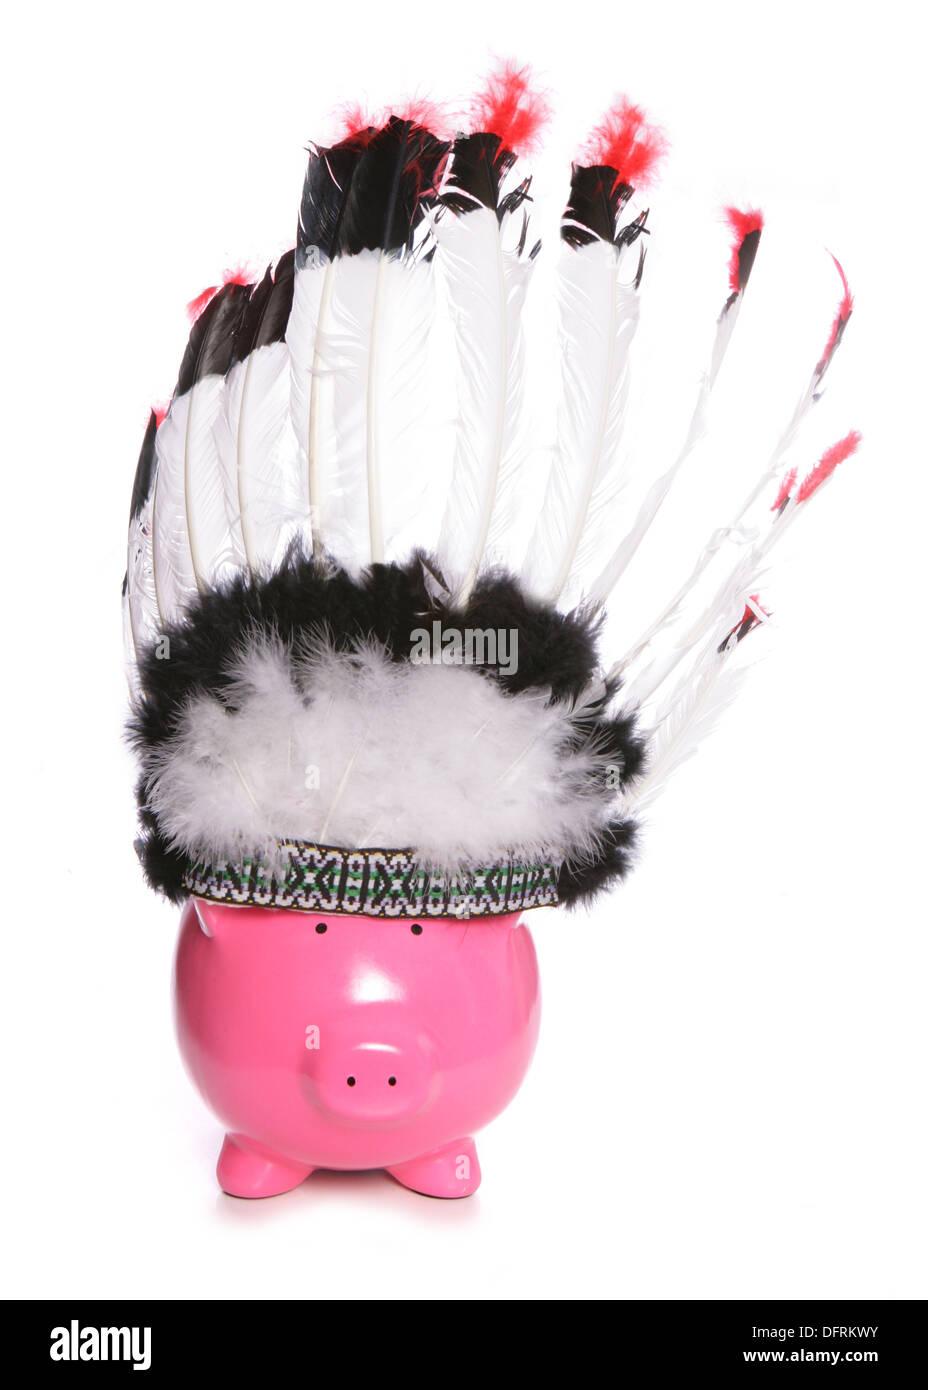 Piggy bank wearing a red indian headdress cutout - Stock Image